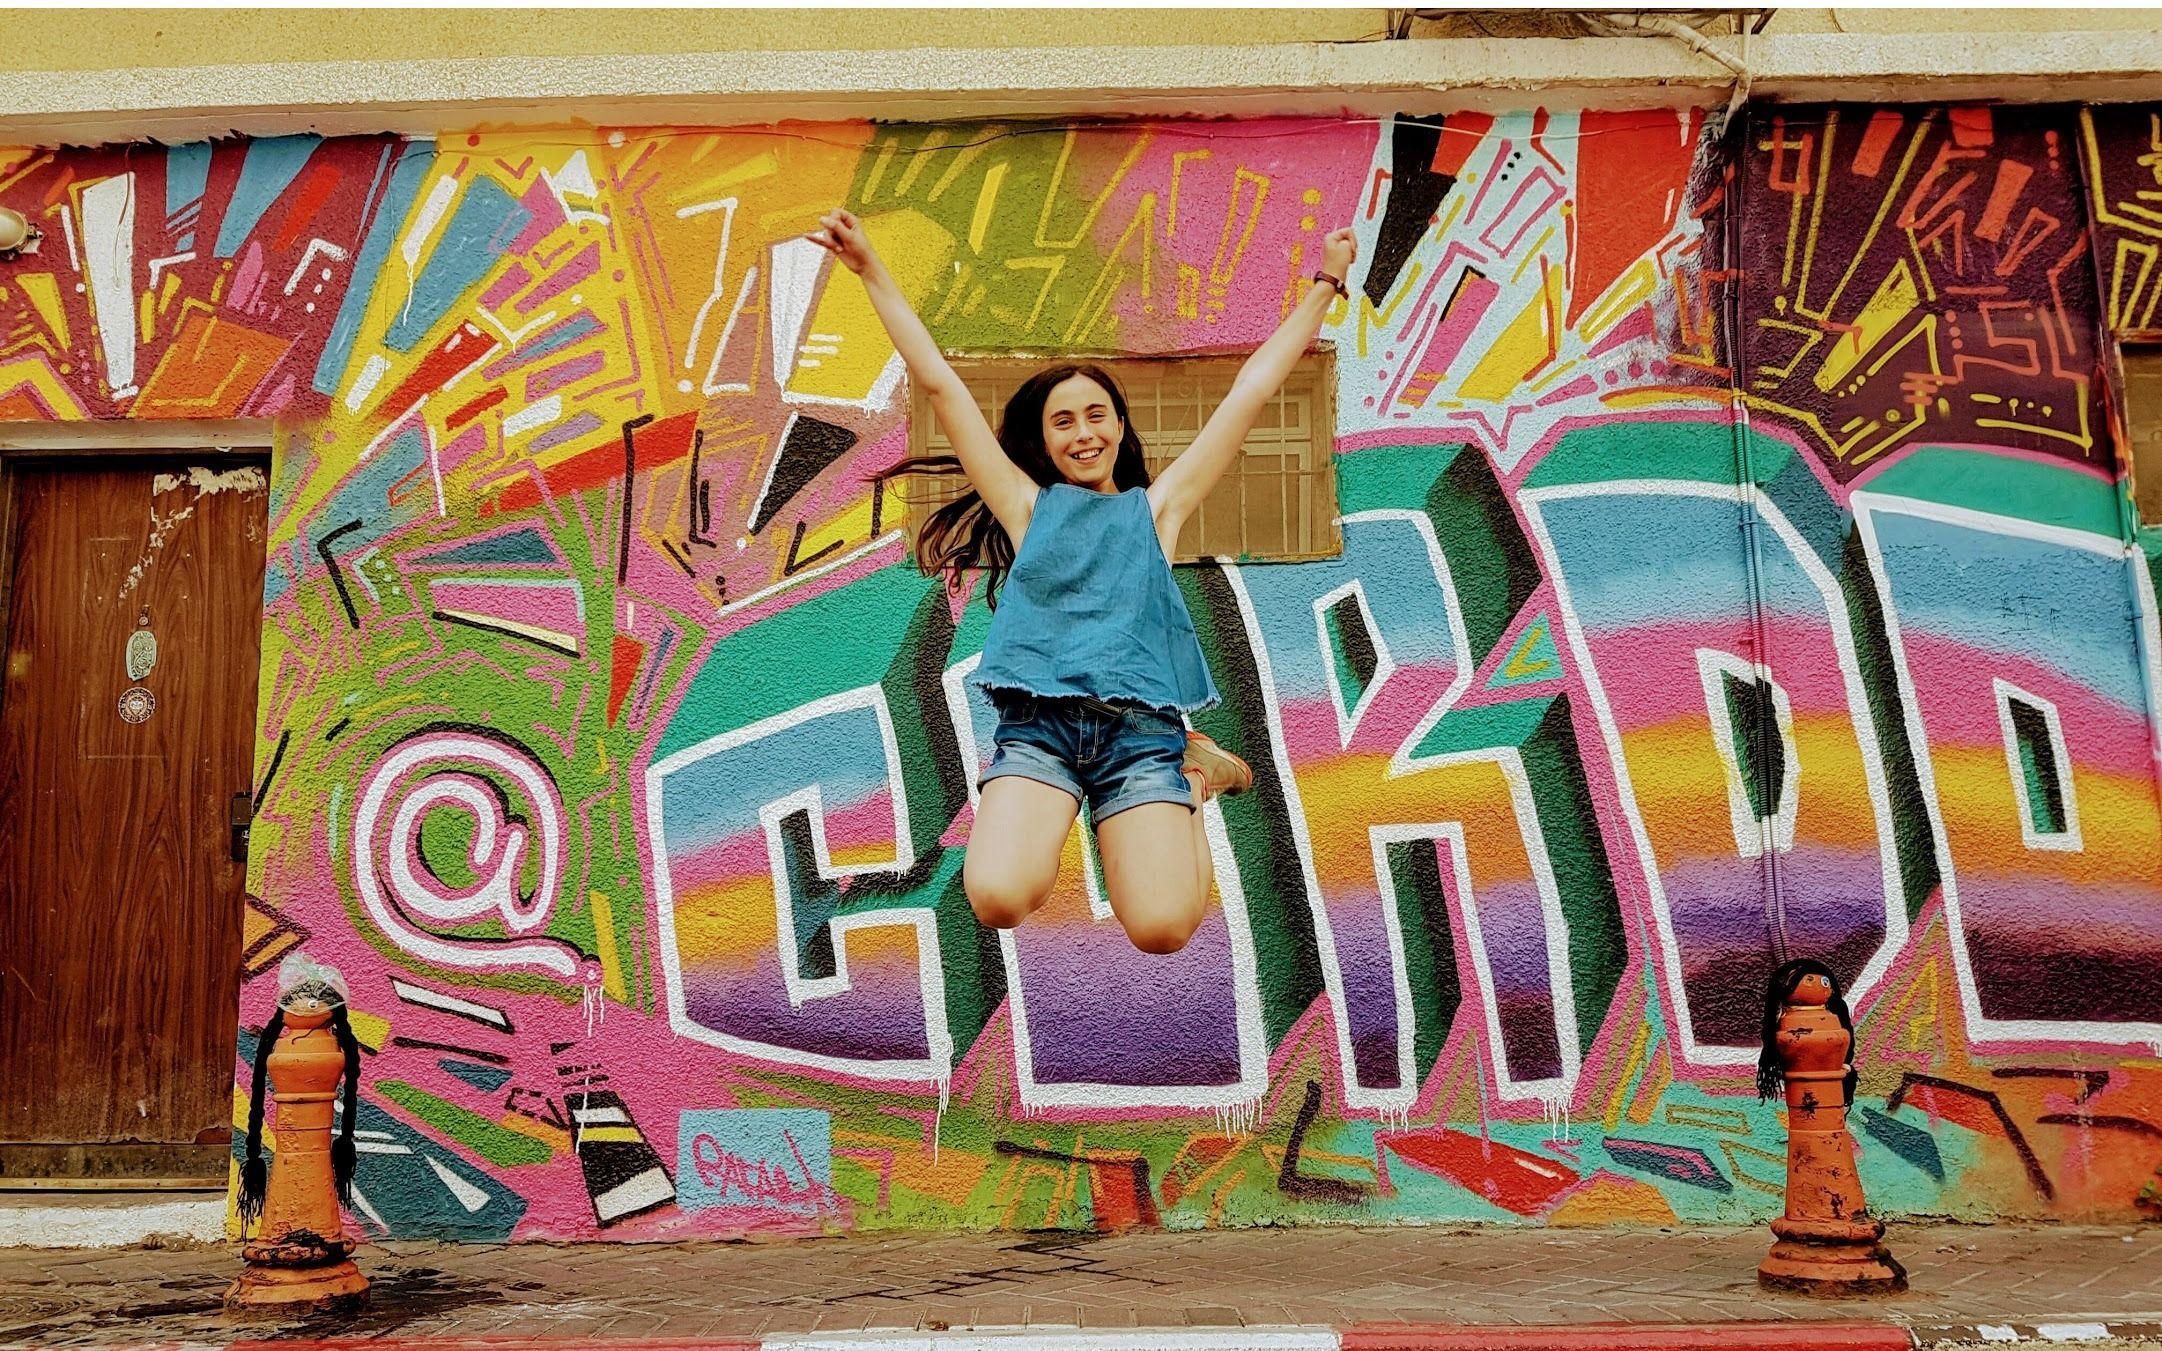 Graffiti Tour in Florentine, Tel Aviv